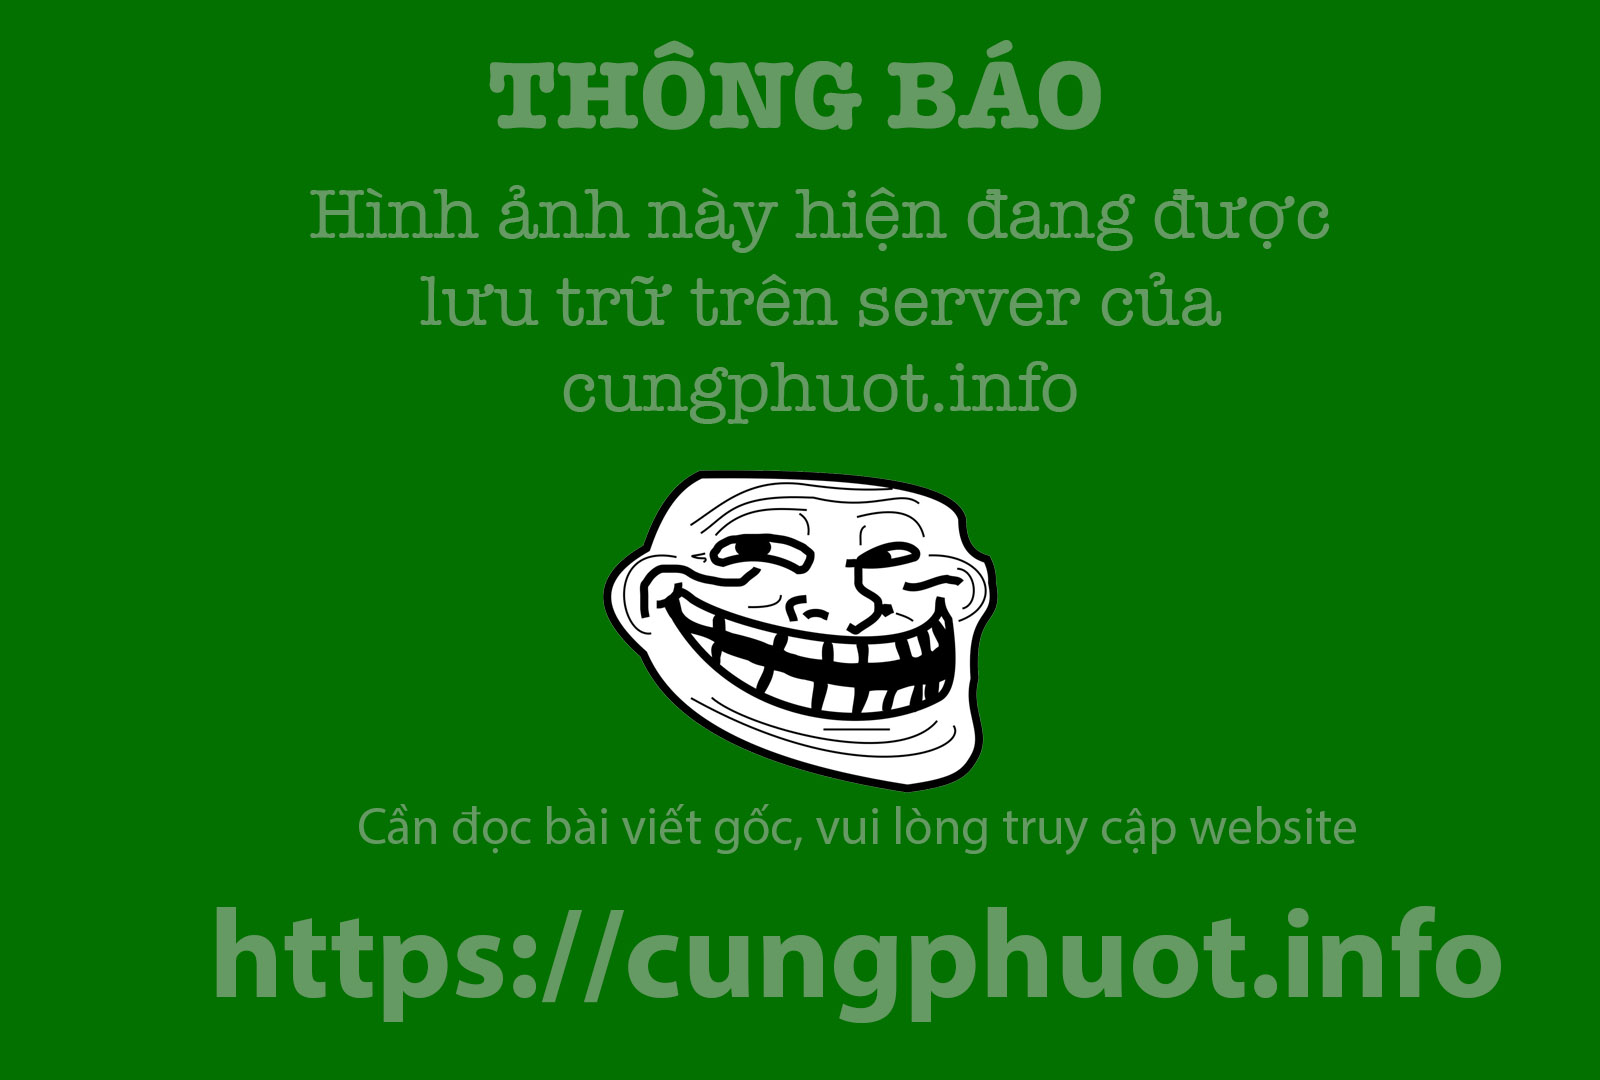 Co do Hue dep la trong suong mu hinh anh 13